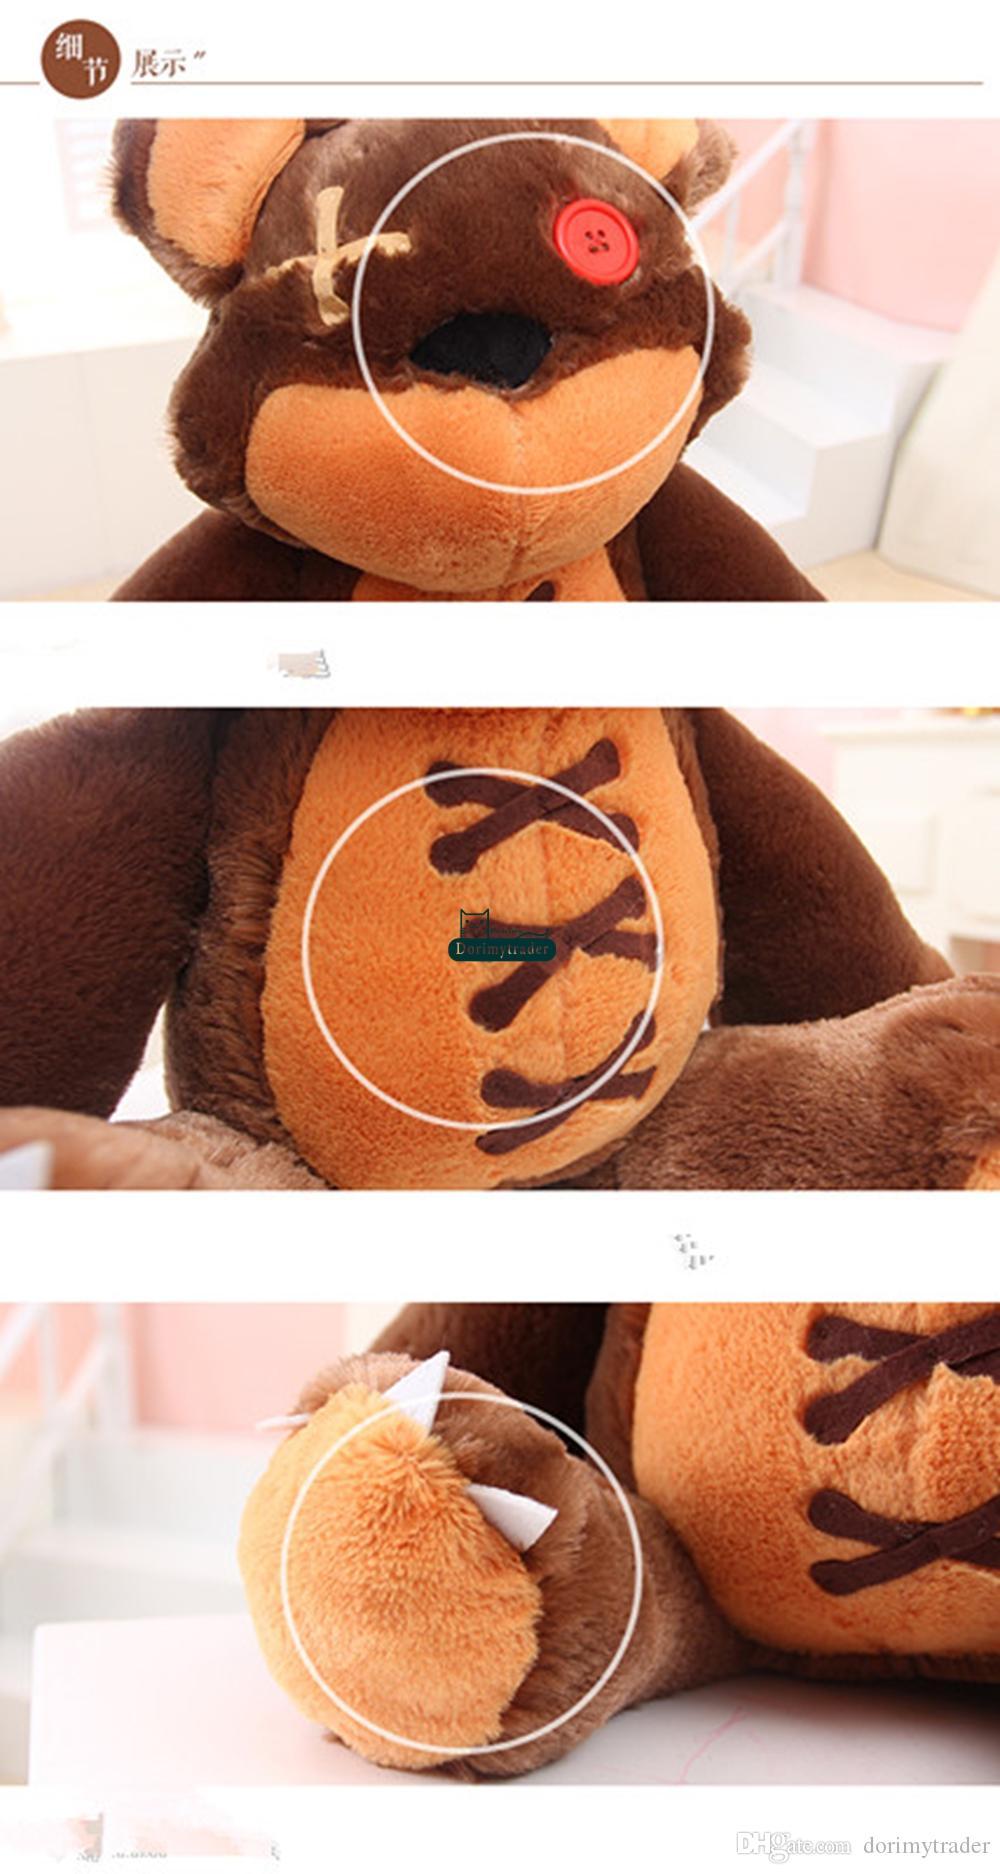 Dorimytrader Hot New 24'' / 60cm Big Stuffed Soft Plush Cute Giant Bear Toy, Nice Gift for Babies, DY60679